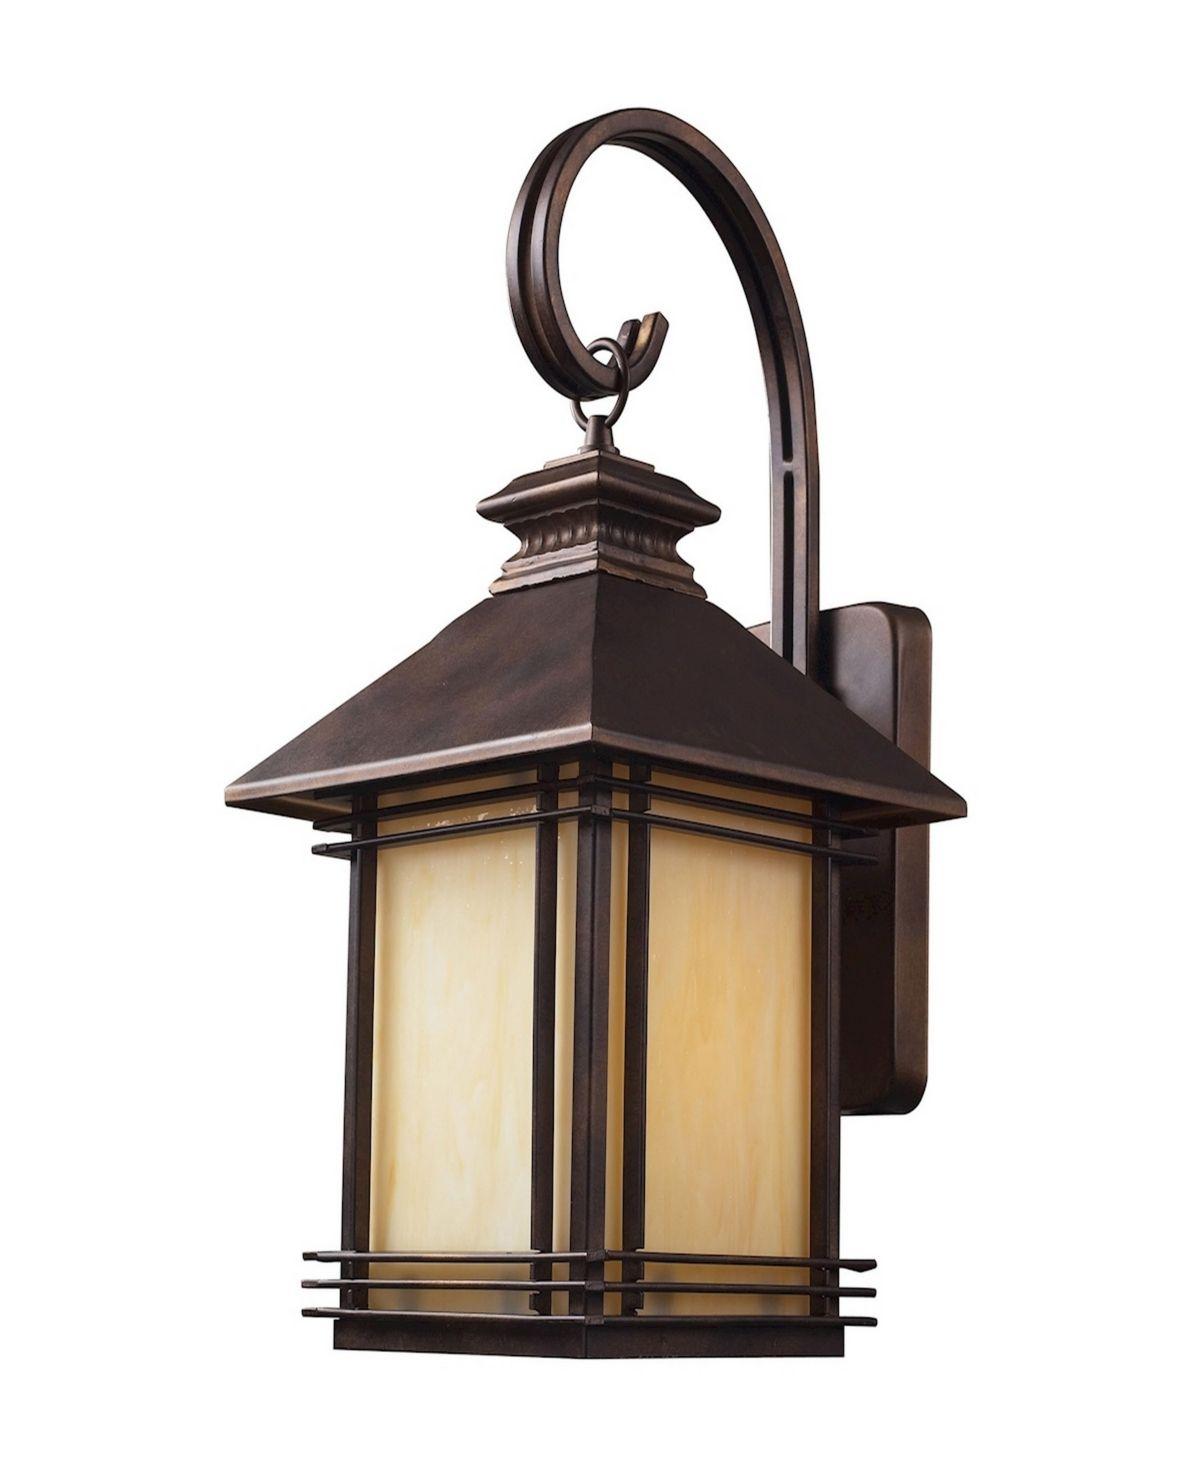 Elk Lighting Blackwell 1 Light Outdoor Wall Sconce In Hazelnut Bronze Reviews Home Macy S Outdoor Sconces Outdoor Wall Sconce Elk Lighting